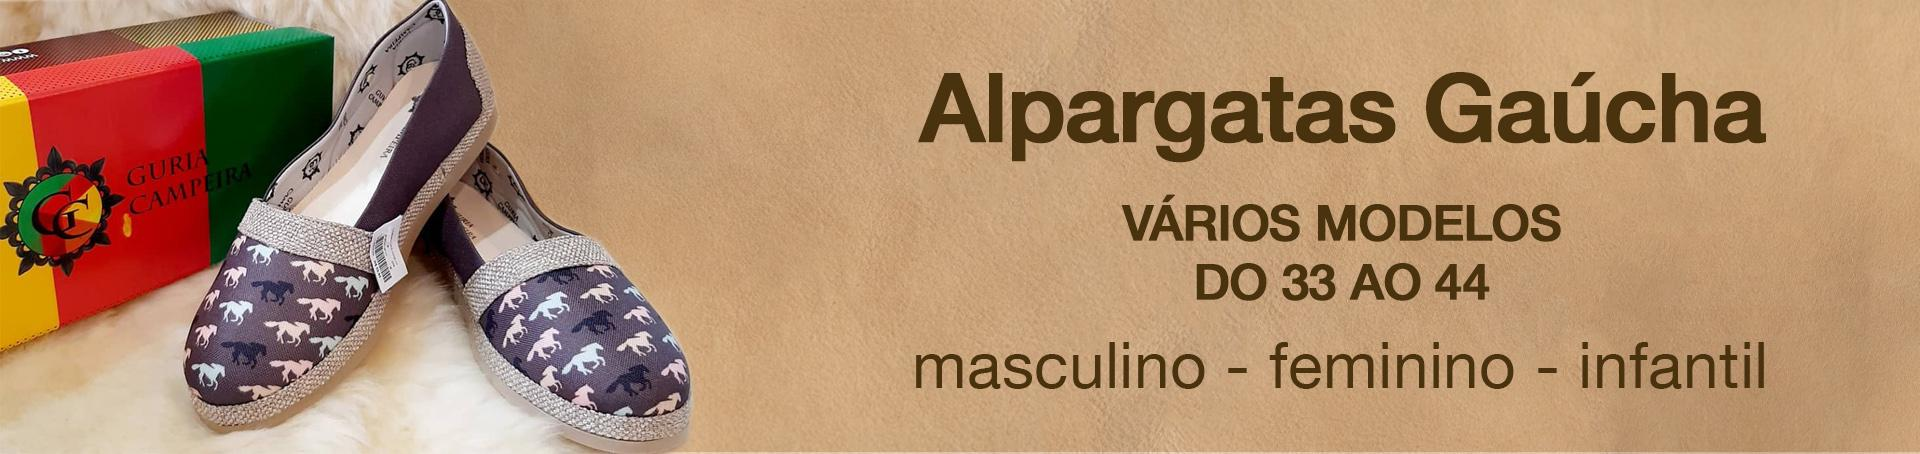 Alpargatas Gaúcha